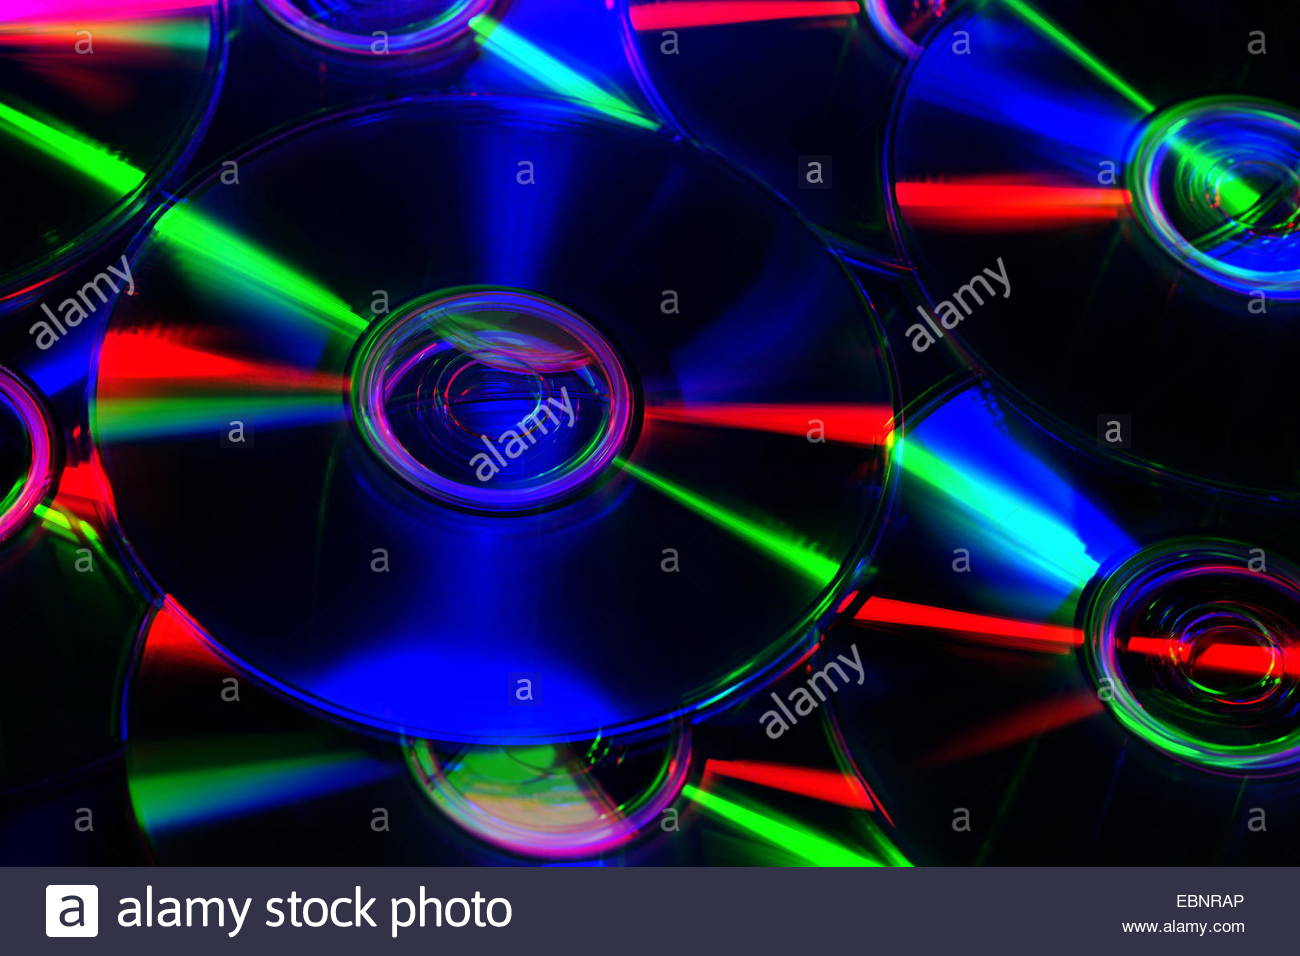 DVD, CD-ROM, Blu-ray Disc - Stock Image